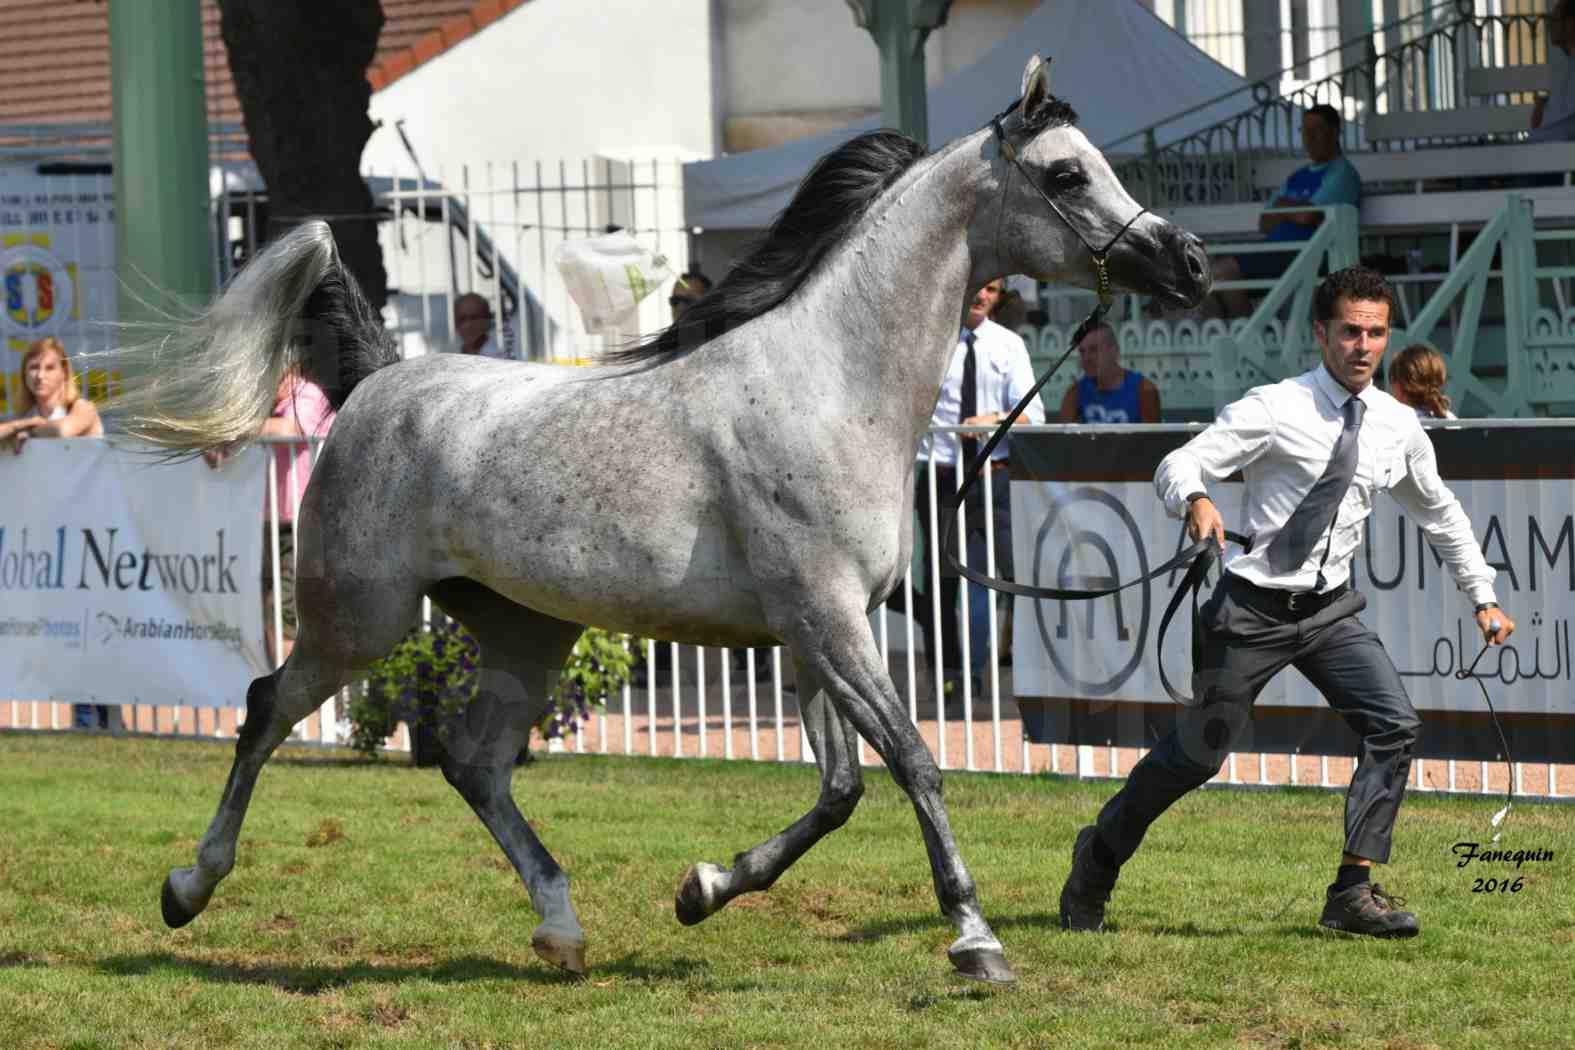 International Arabian Horse Show B de VICHY 2016 - ISABELLA - Notre Sélection - 02